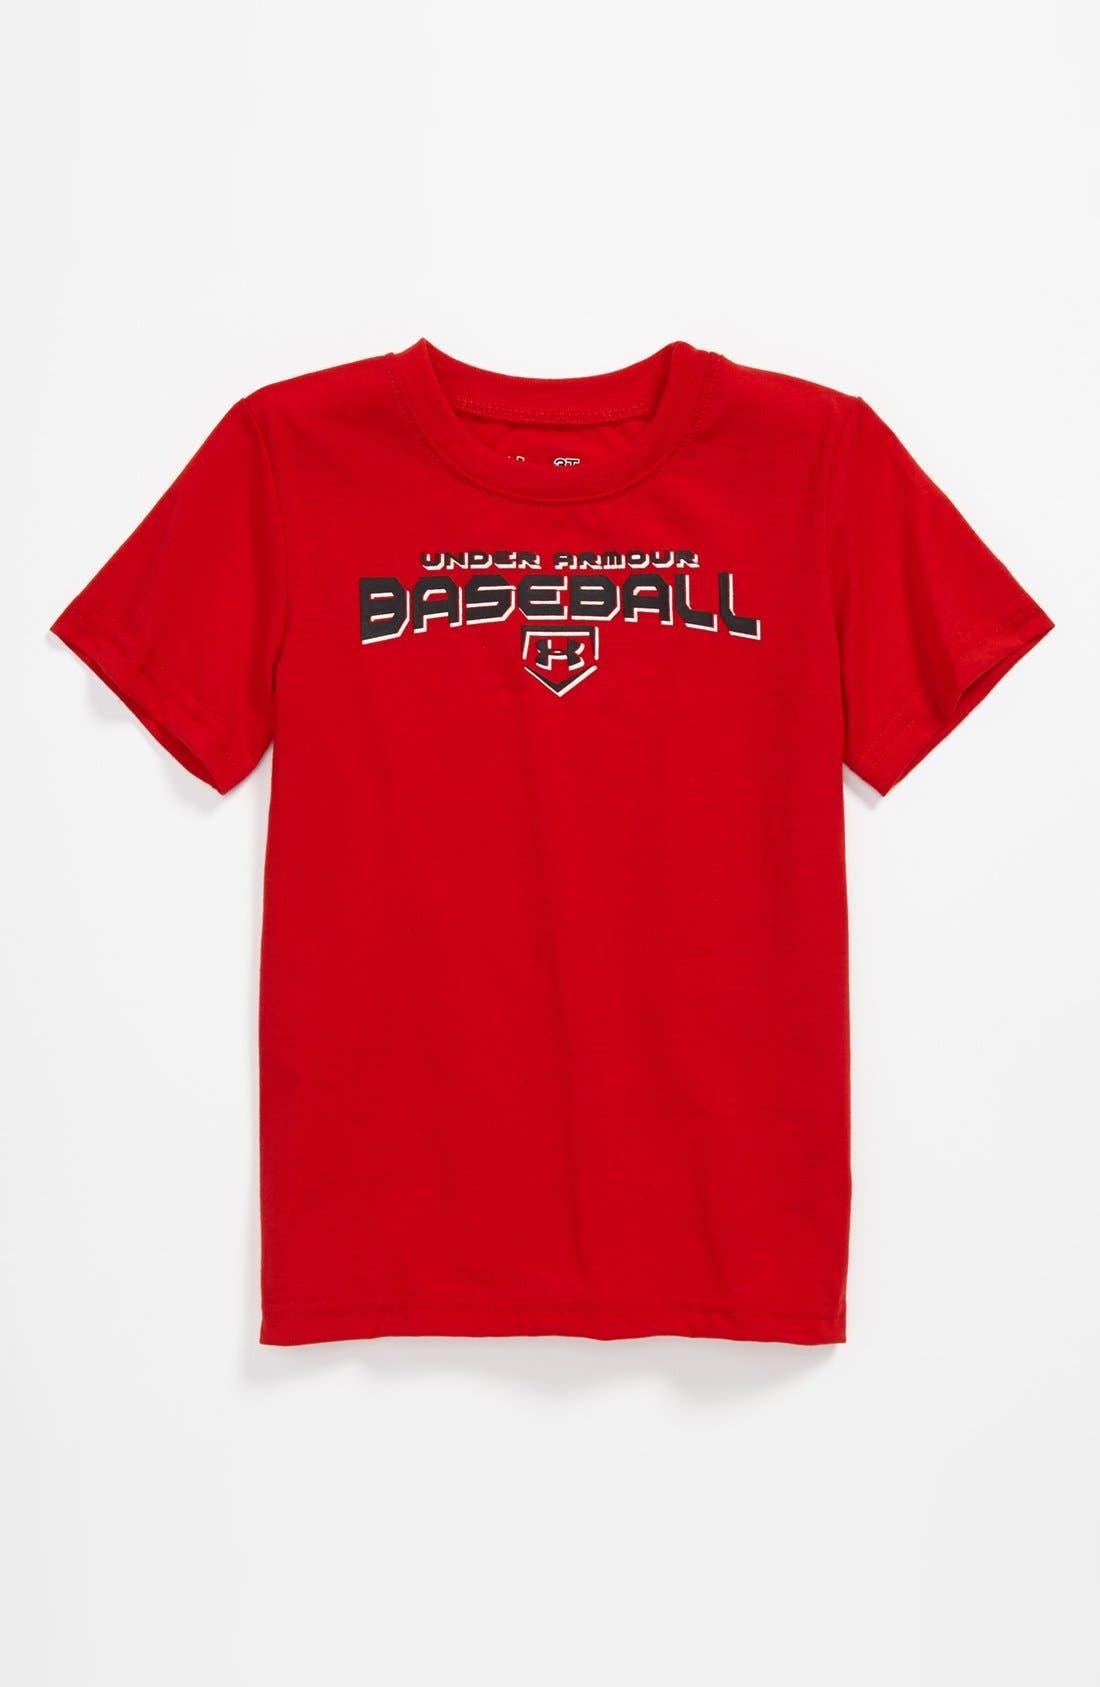 Alternate Image 1 Selected - Under Armour 'Baseball' T-Shirt (Toddler)